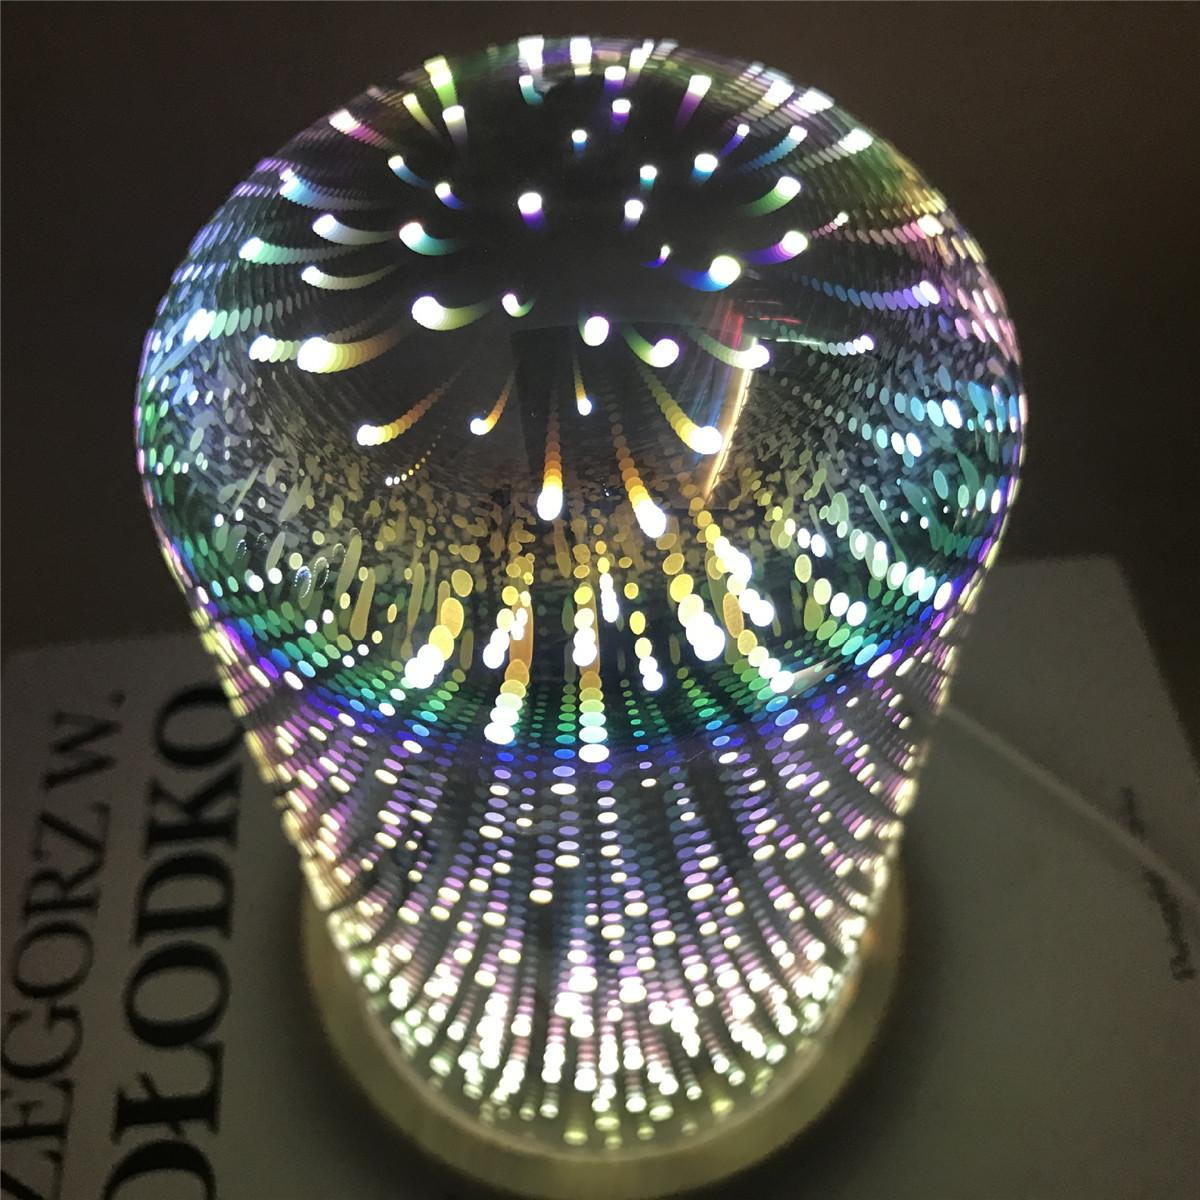 LED Glass Tree Flower Starburst Shaped Wooden Base Night